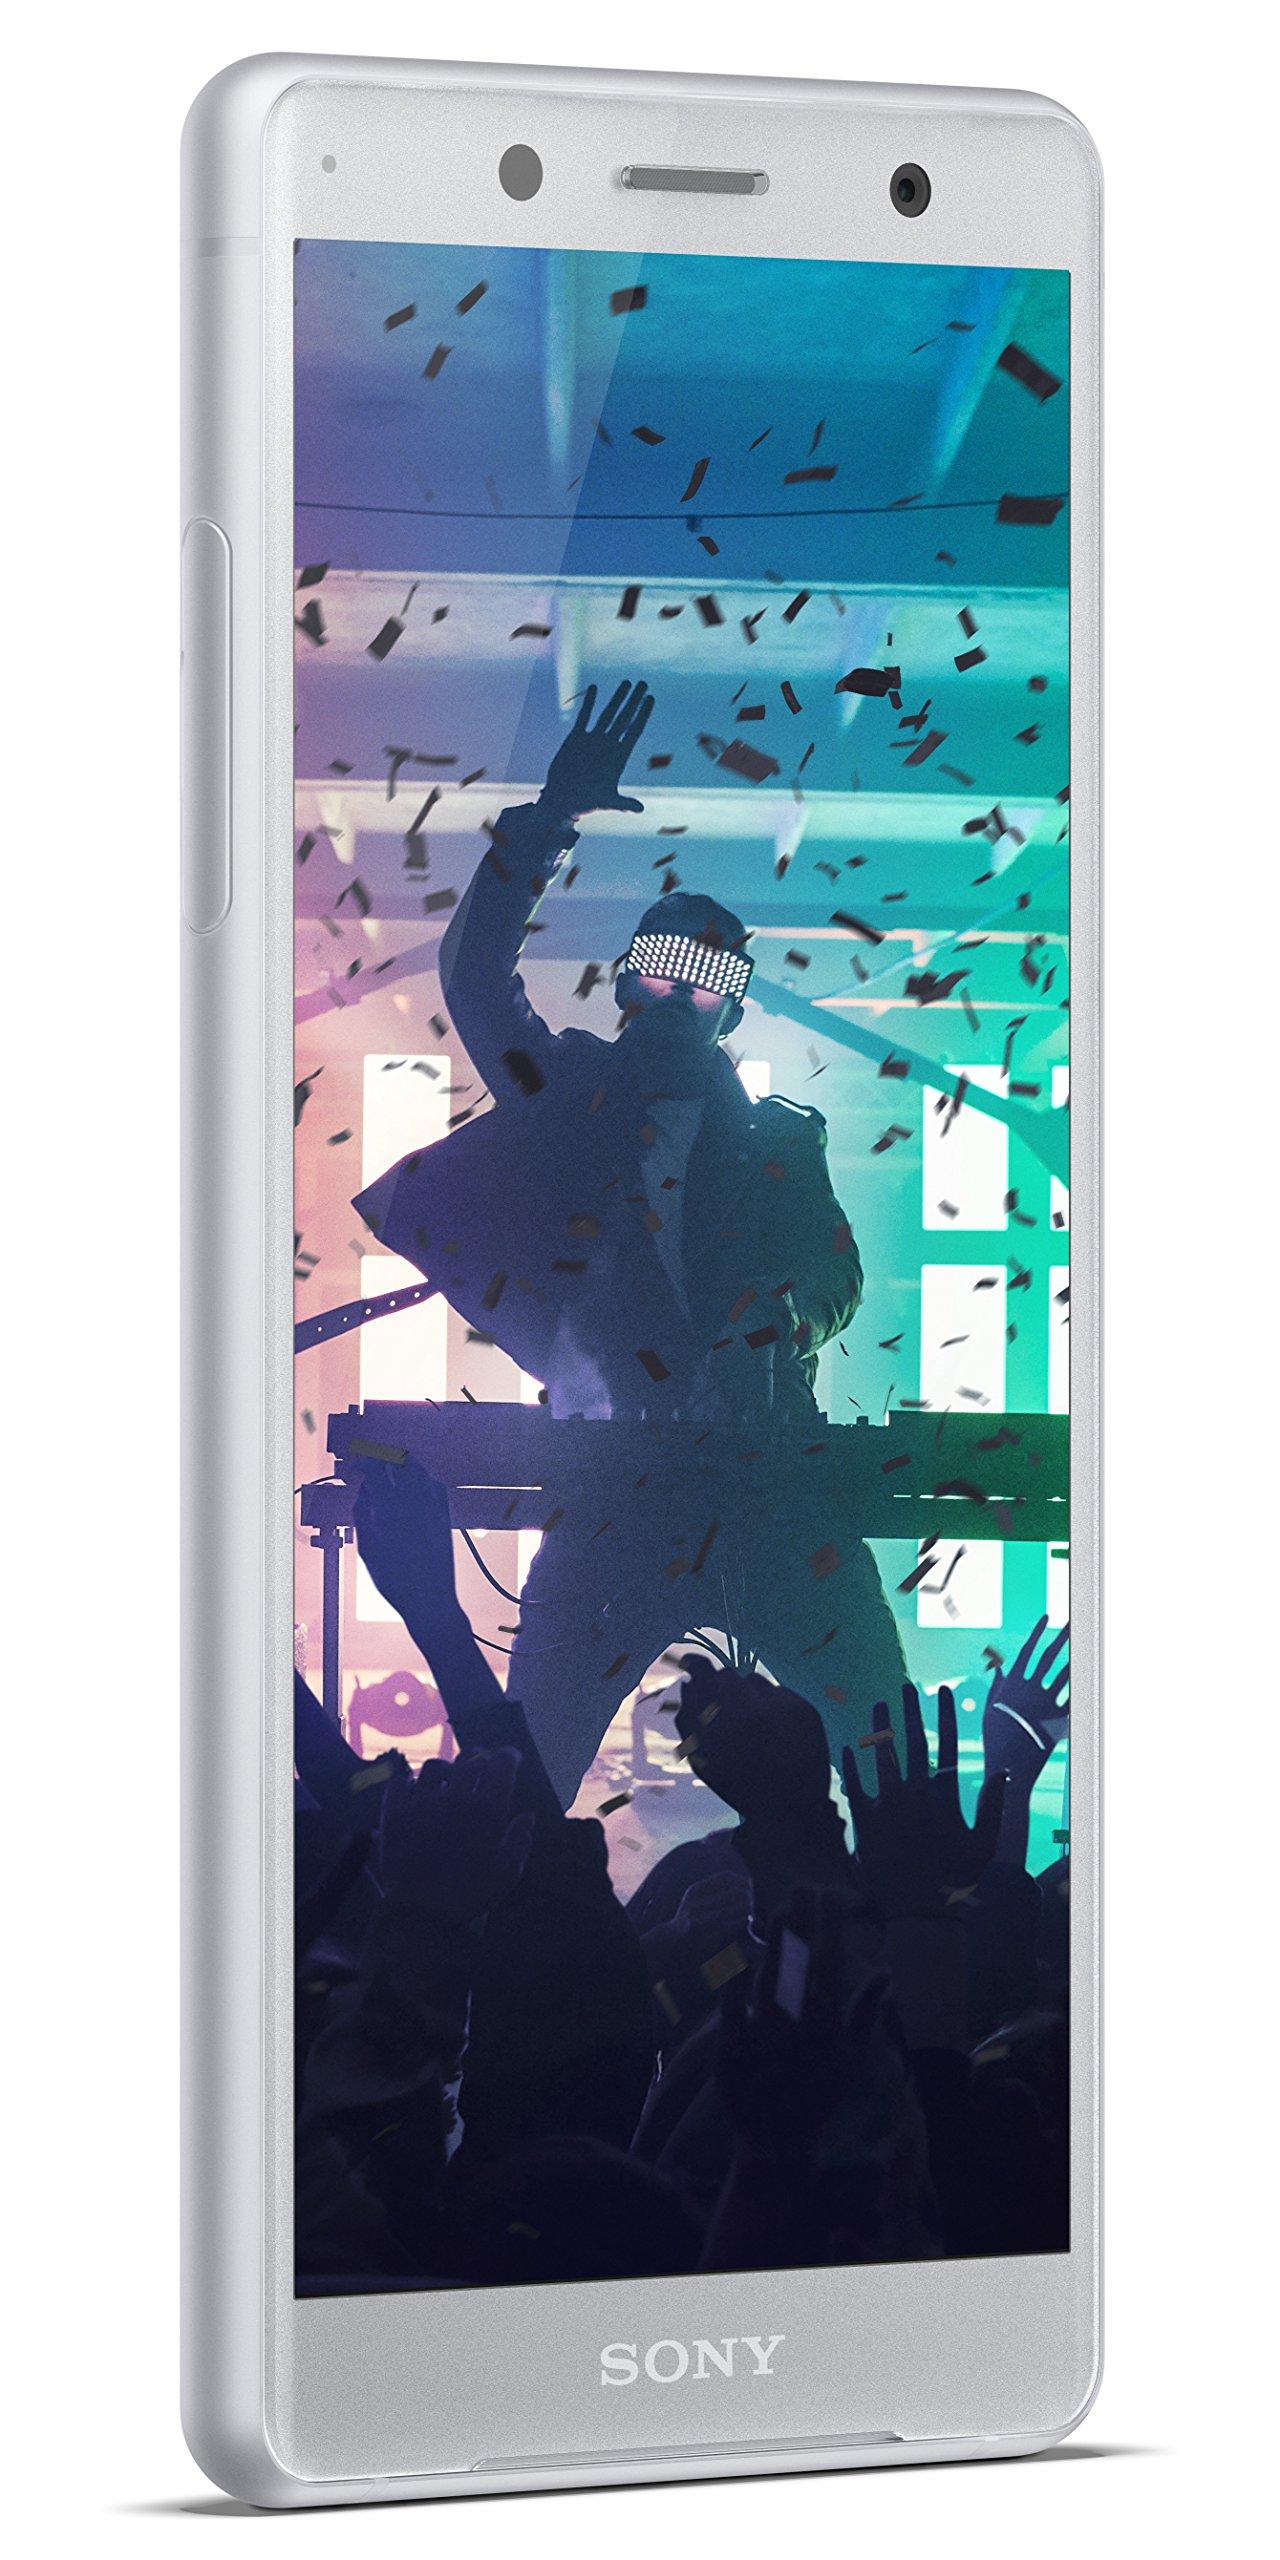 Sony Xperia XZ2 Compact Unlocked Smartphone - 5'' Screen - 64GB - White Silver (US Warranty)